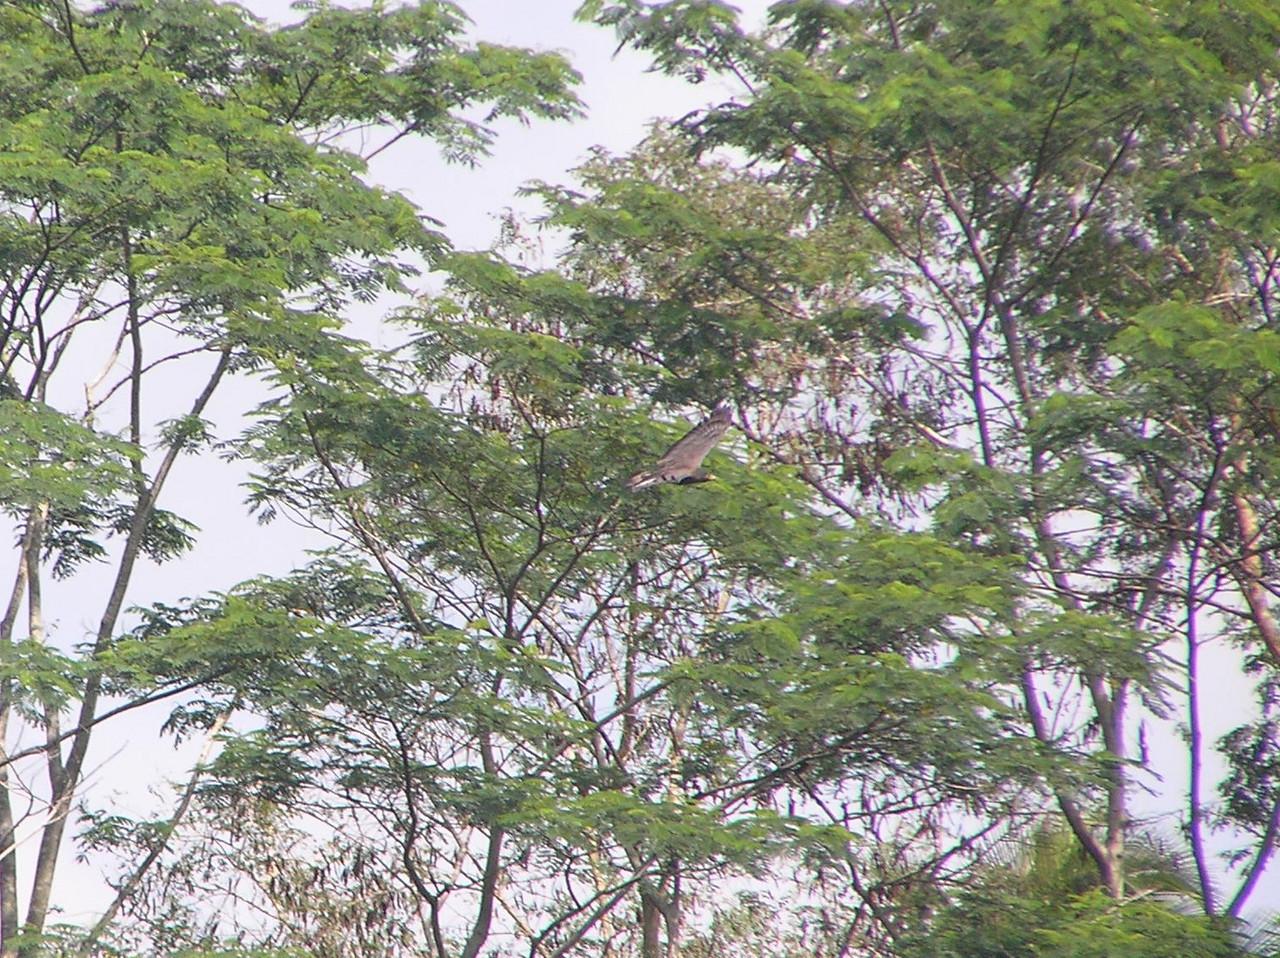 dunno eagle flight 2 bali aug 2010